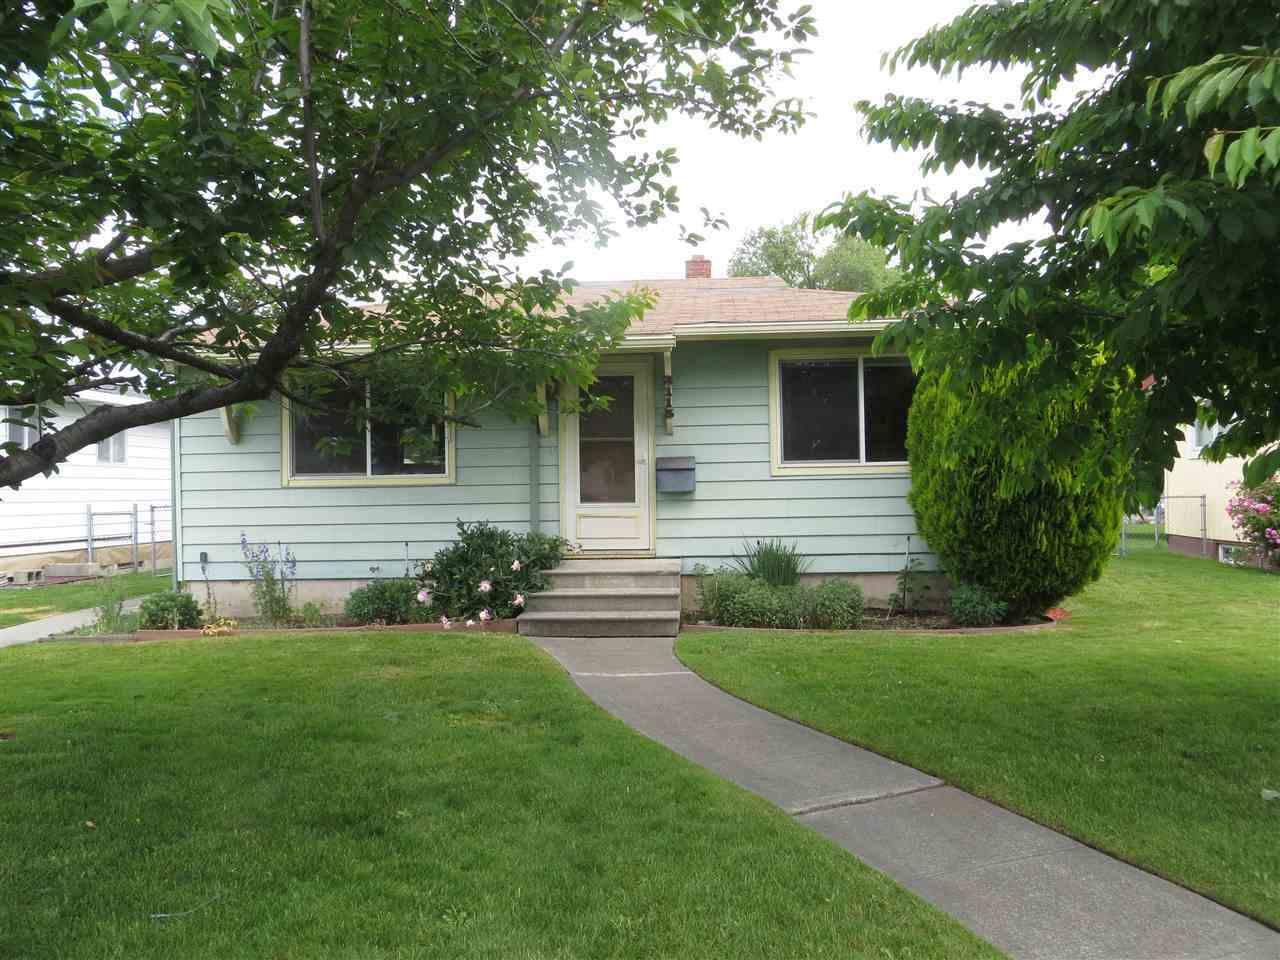 3115 E Ermina Ave, Spokane, WA - USA (photo 1)